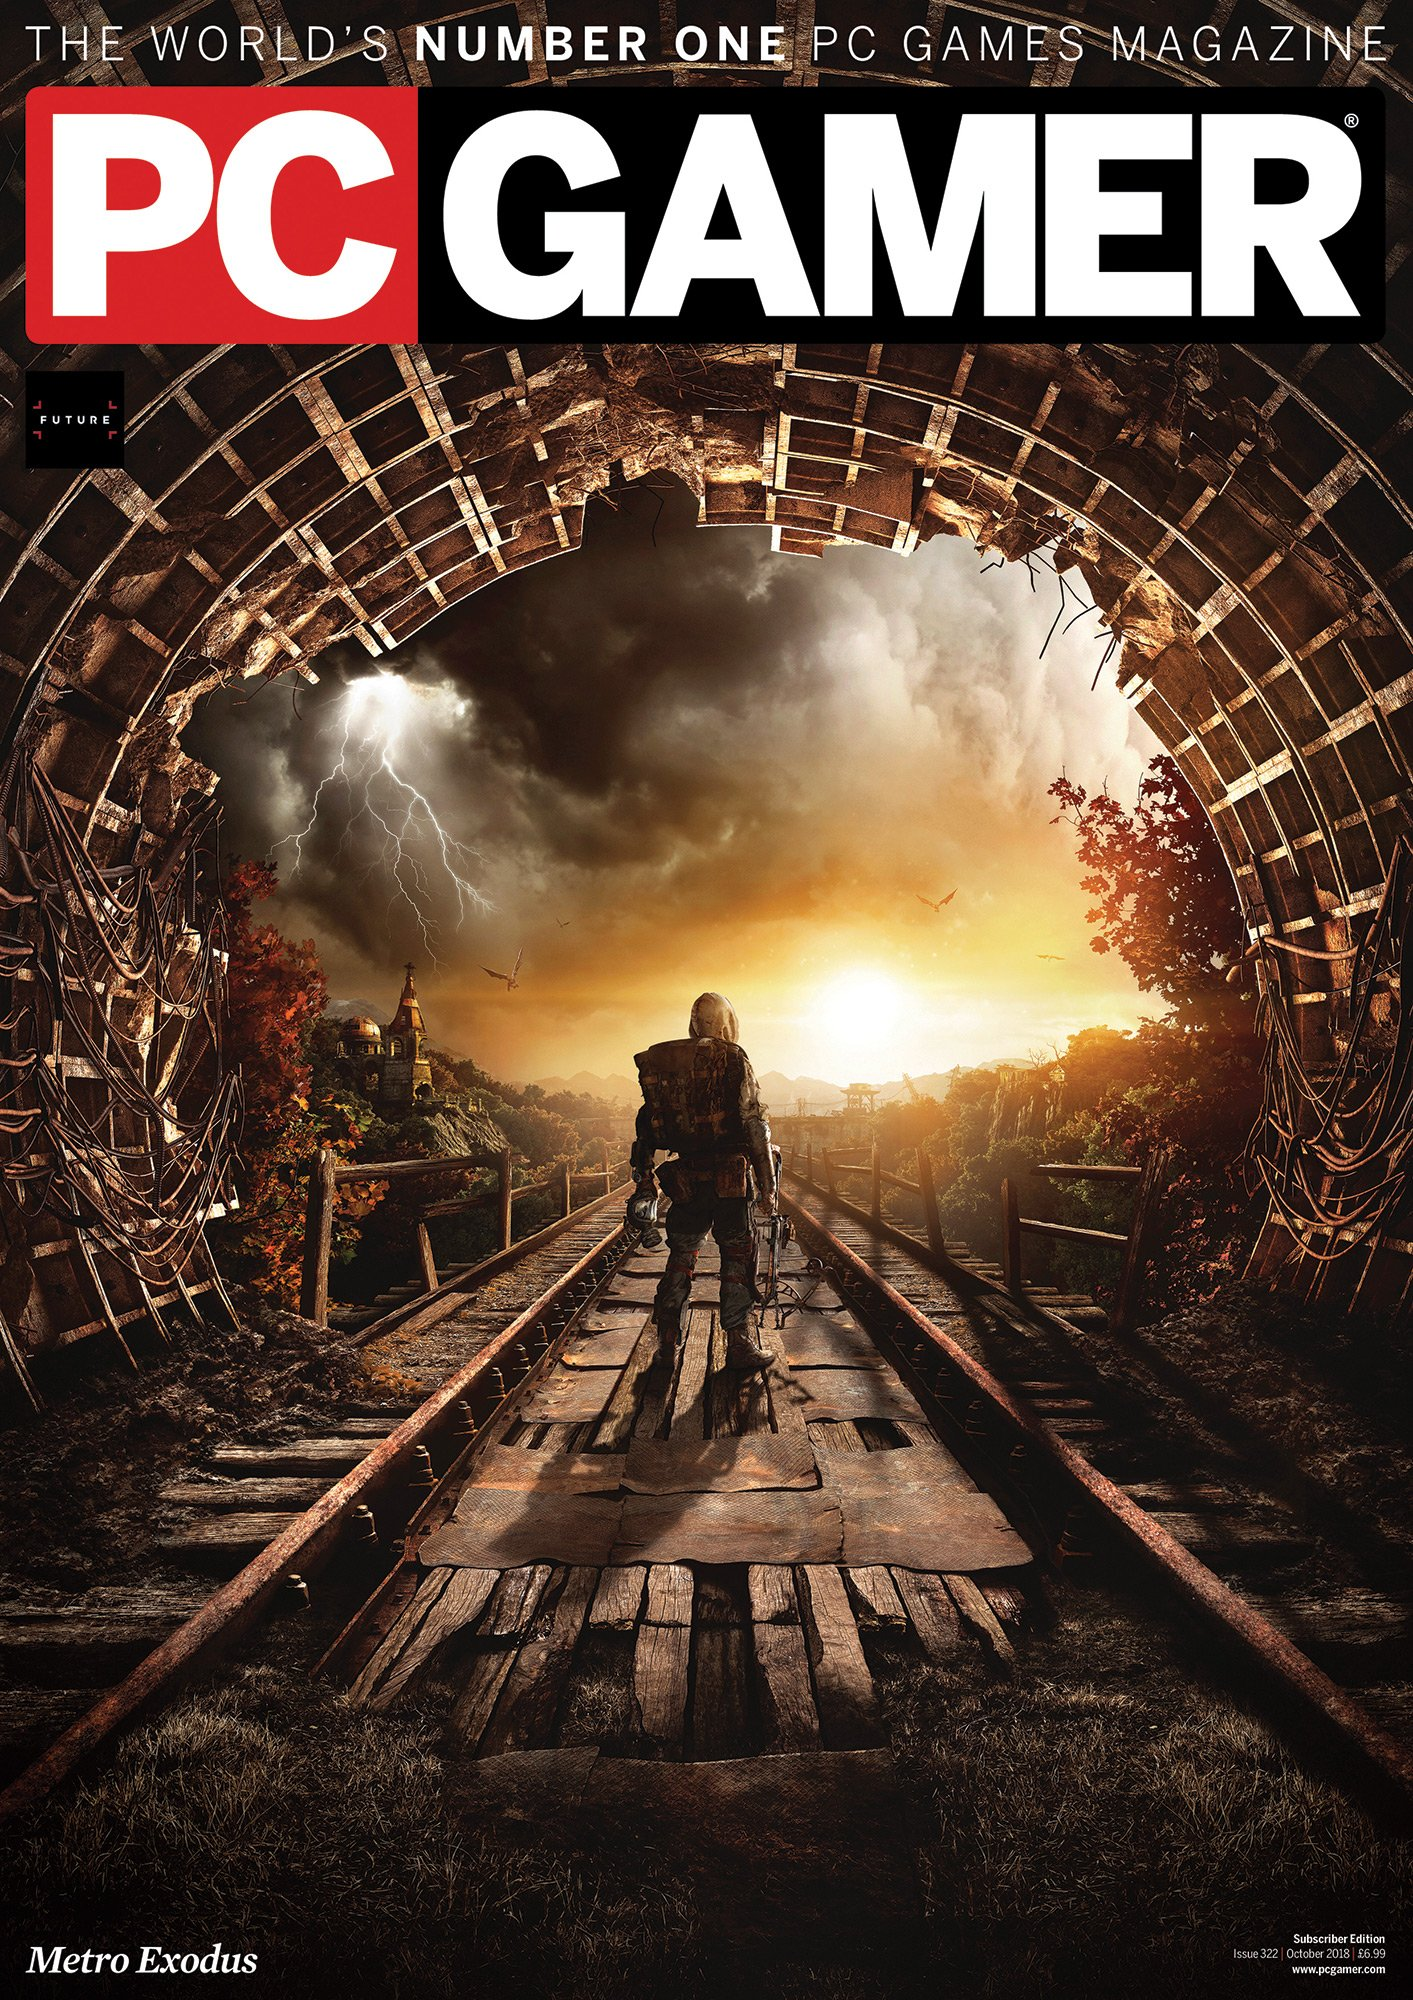 PC Gamer UK 322 (October 2018) (subscriber edition)